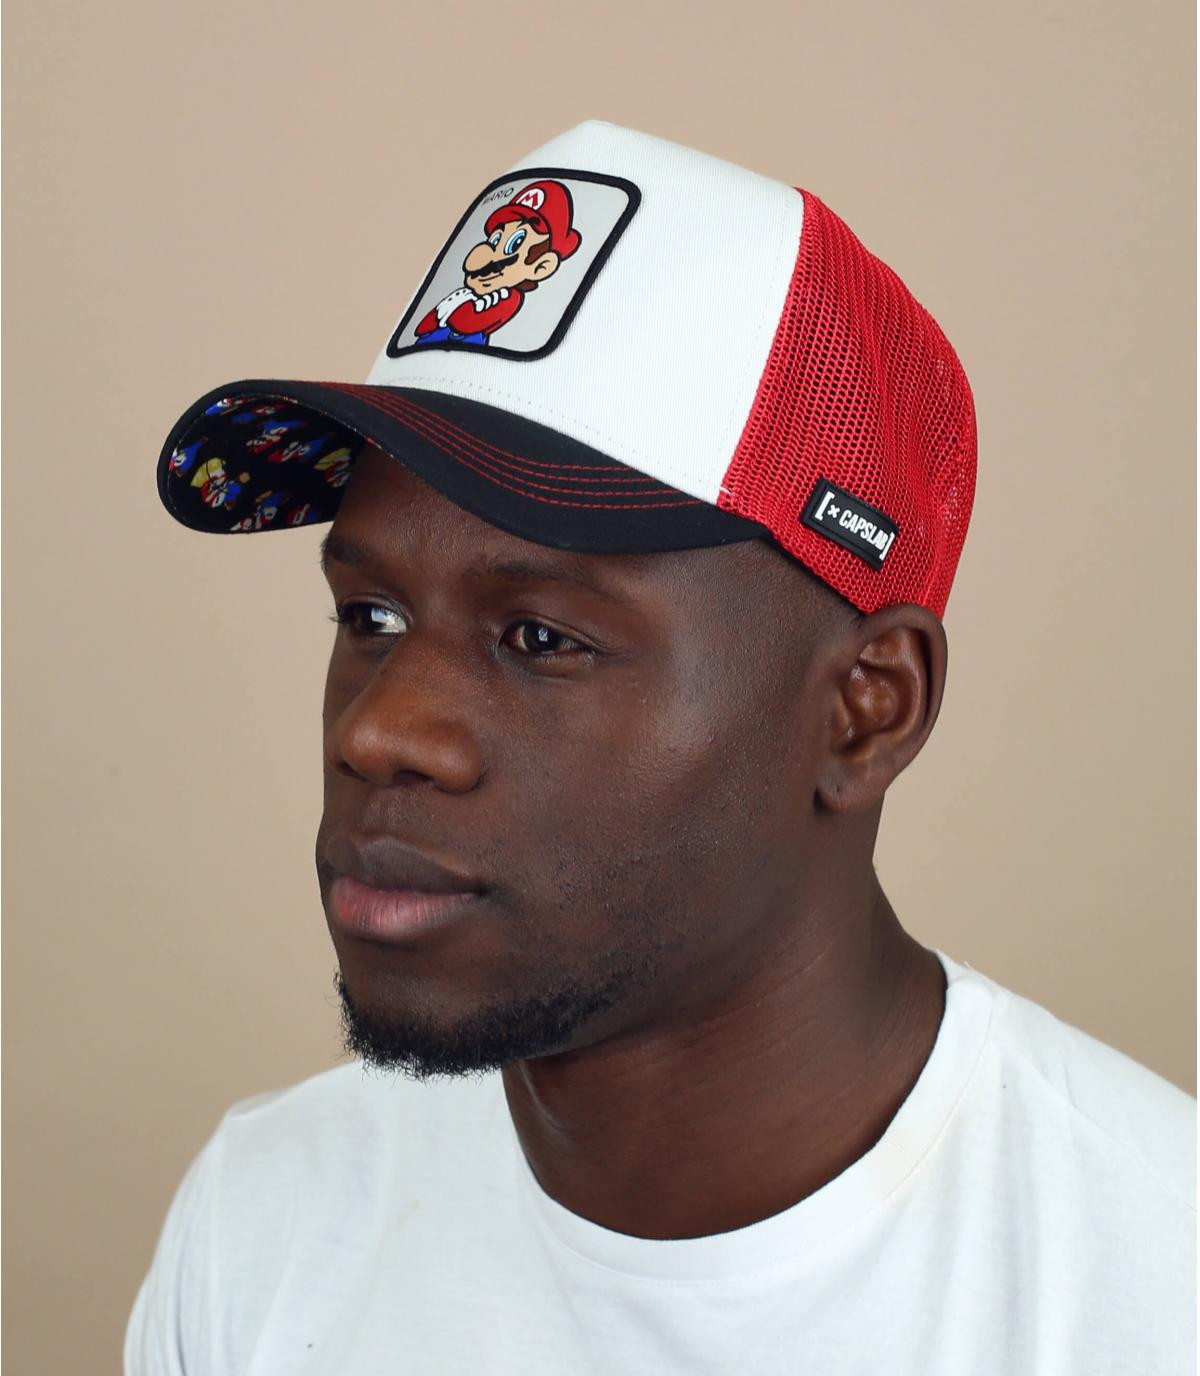 Mario Bros cap